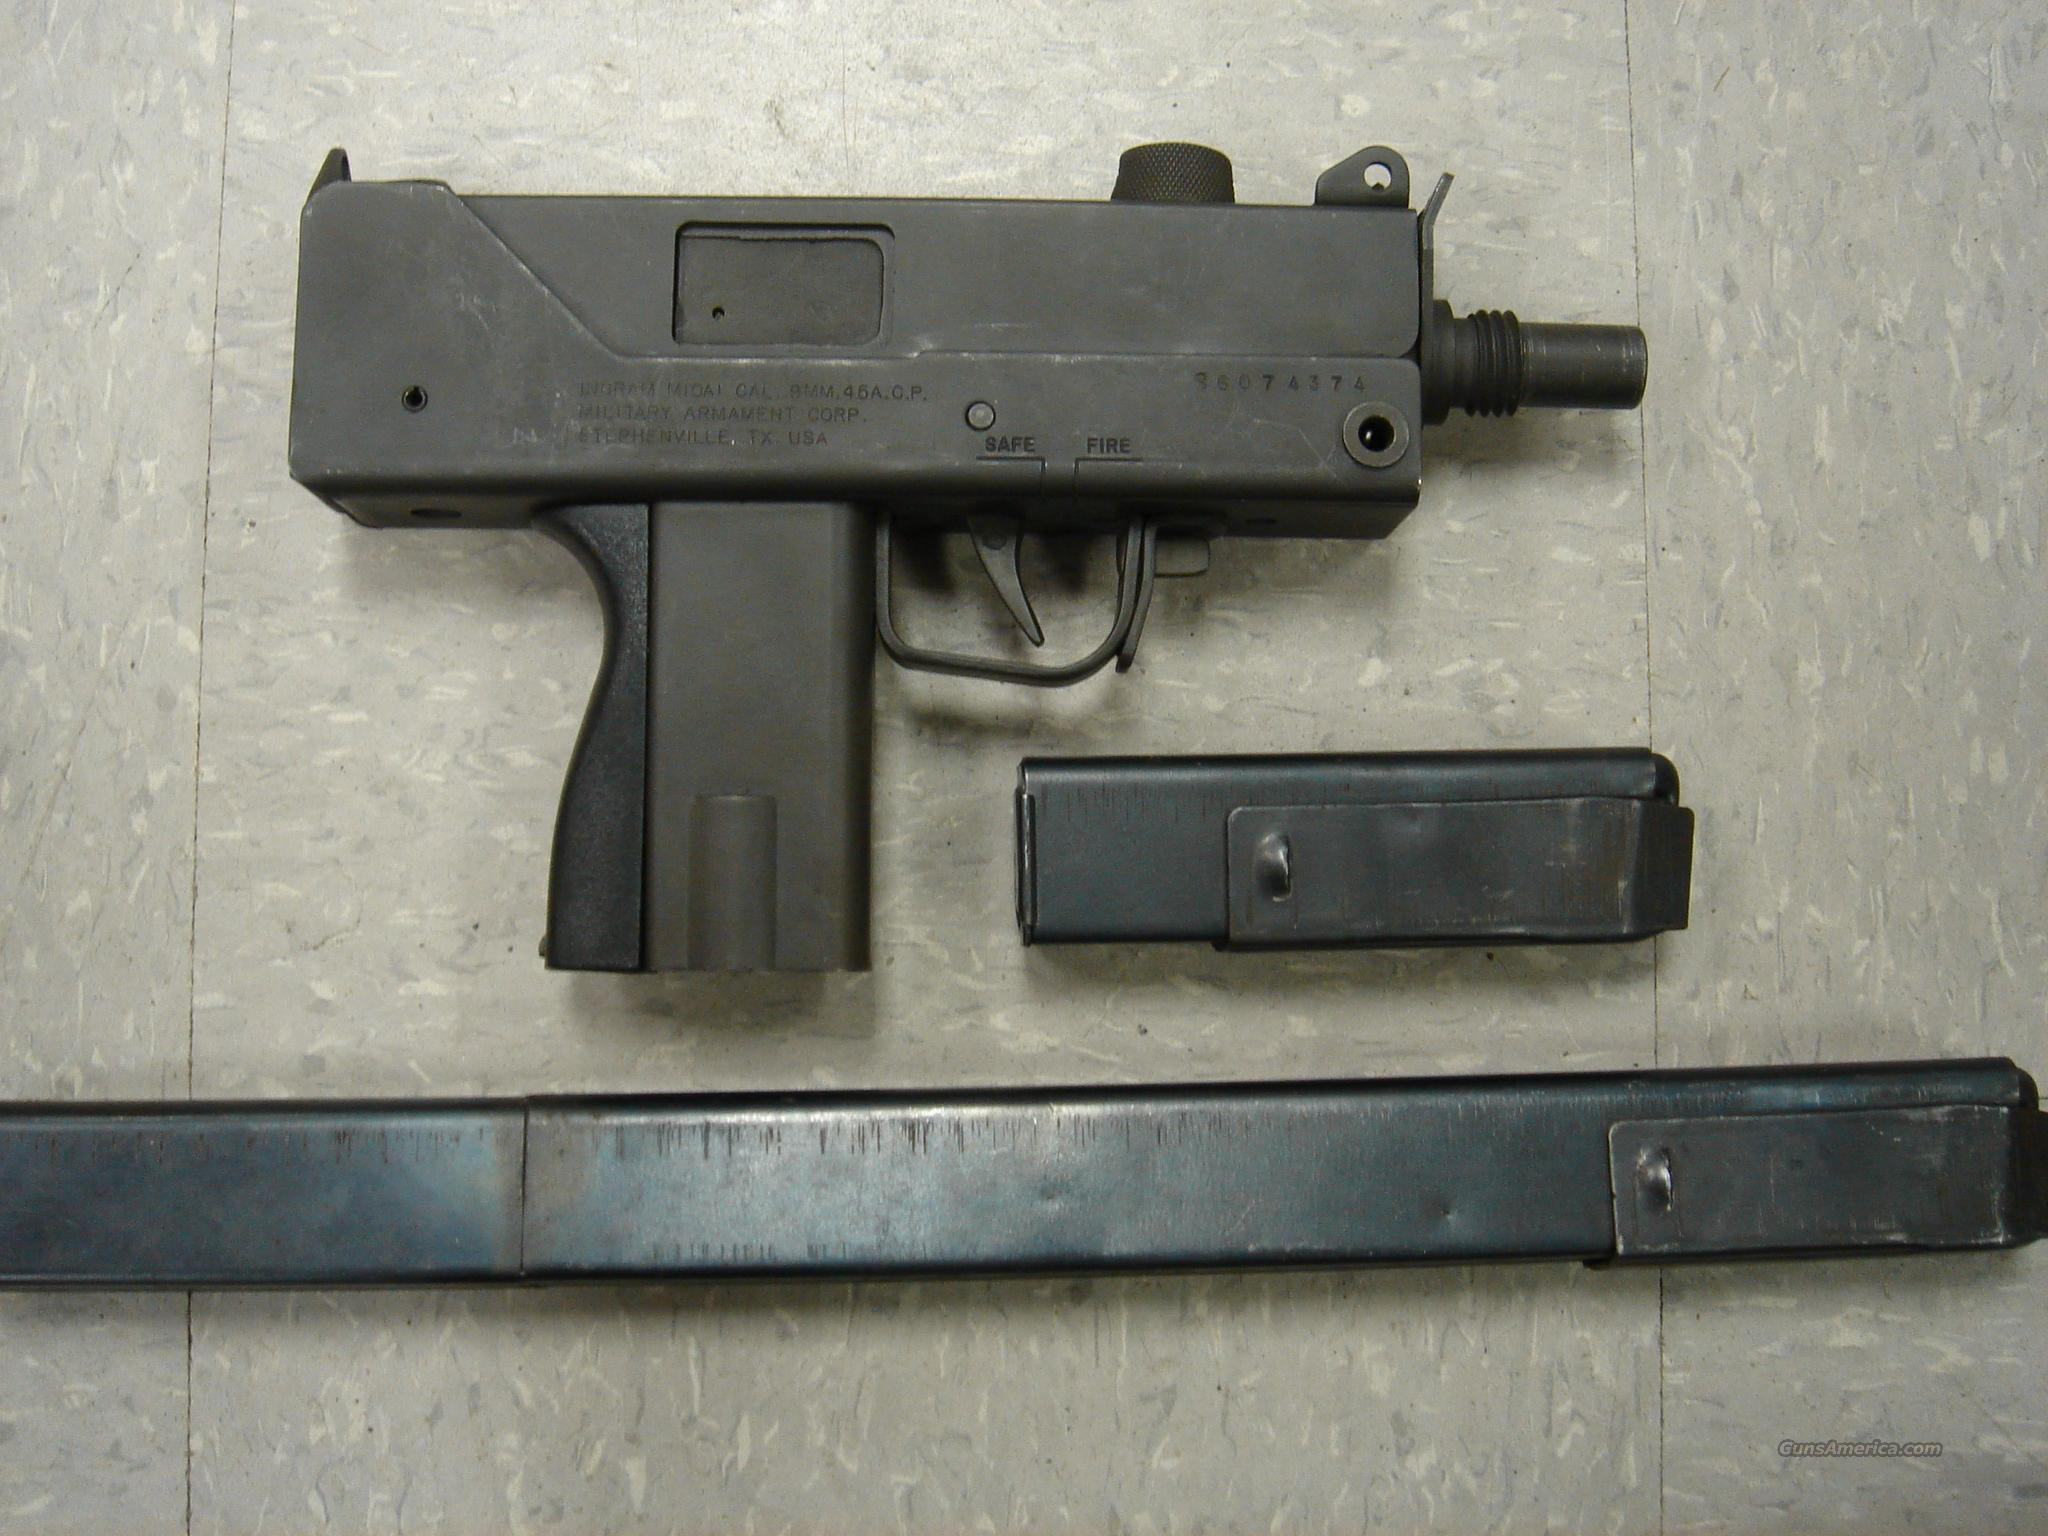 INGRAM, MAC10 , MILITARY ARMAMENT M10A1 9MM PISTOL, SEMI AUTO  Guns > Pistols > Military Misc. Pistols US > Other